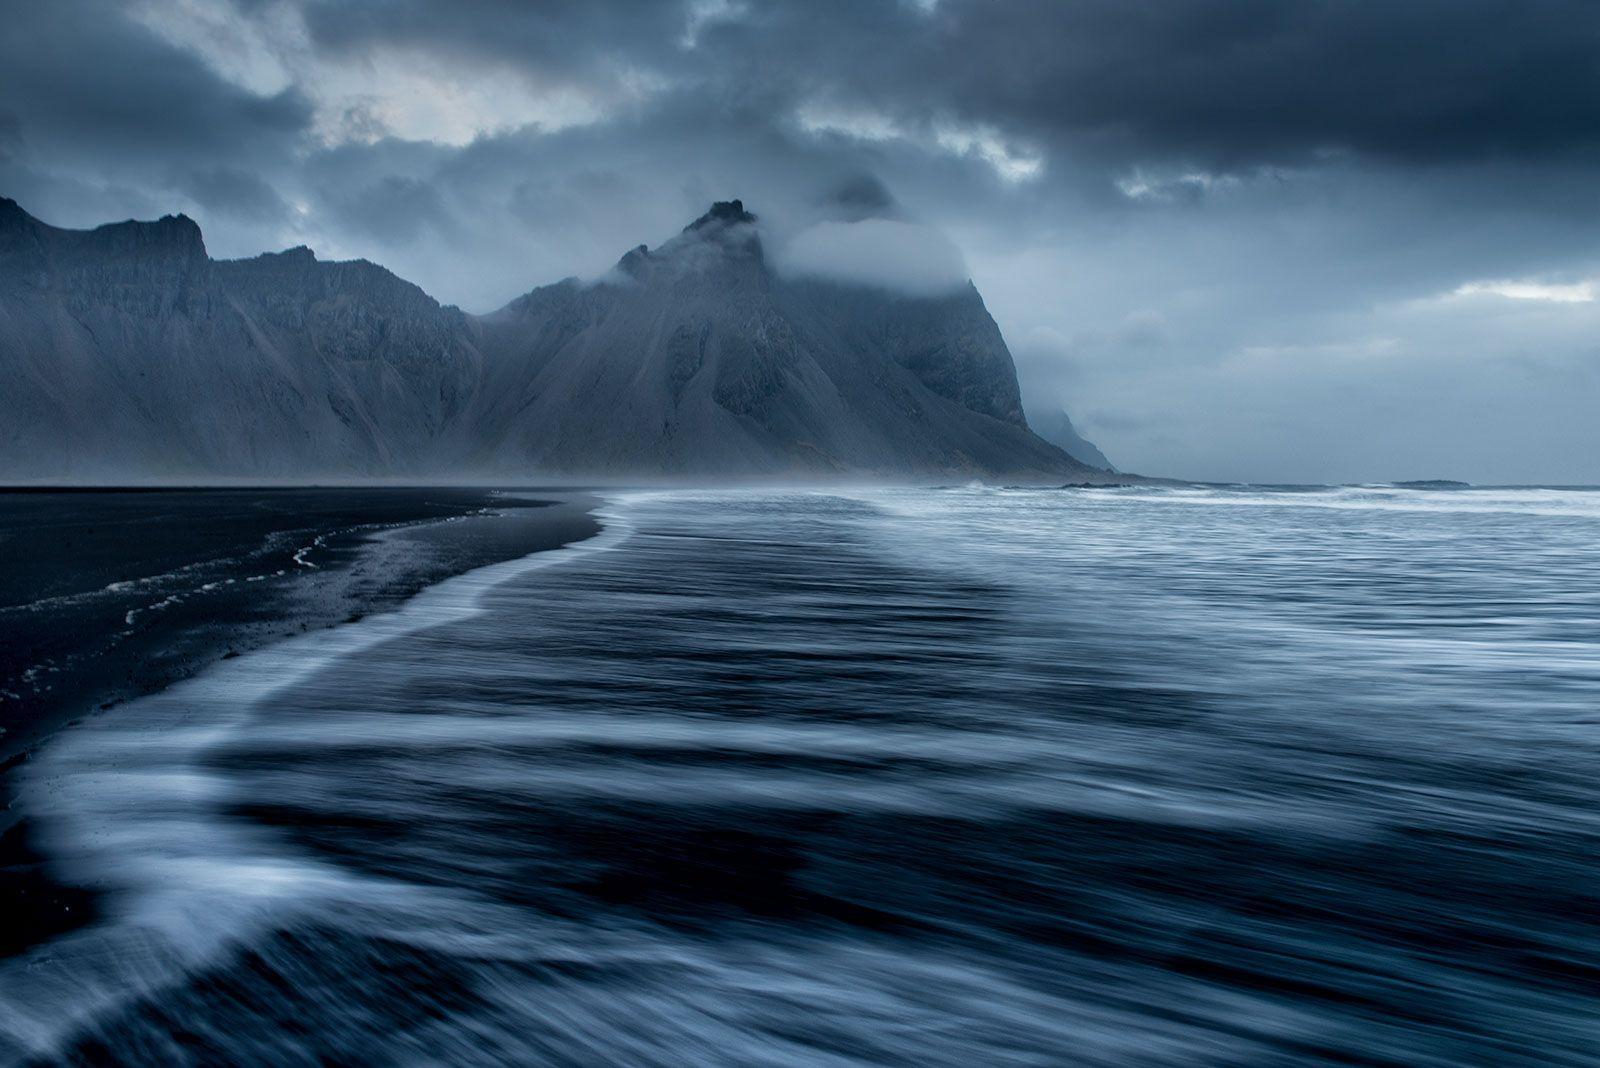 Photographer Alex Mimo - Gloomy Morning # 1689697. 35PHOTO